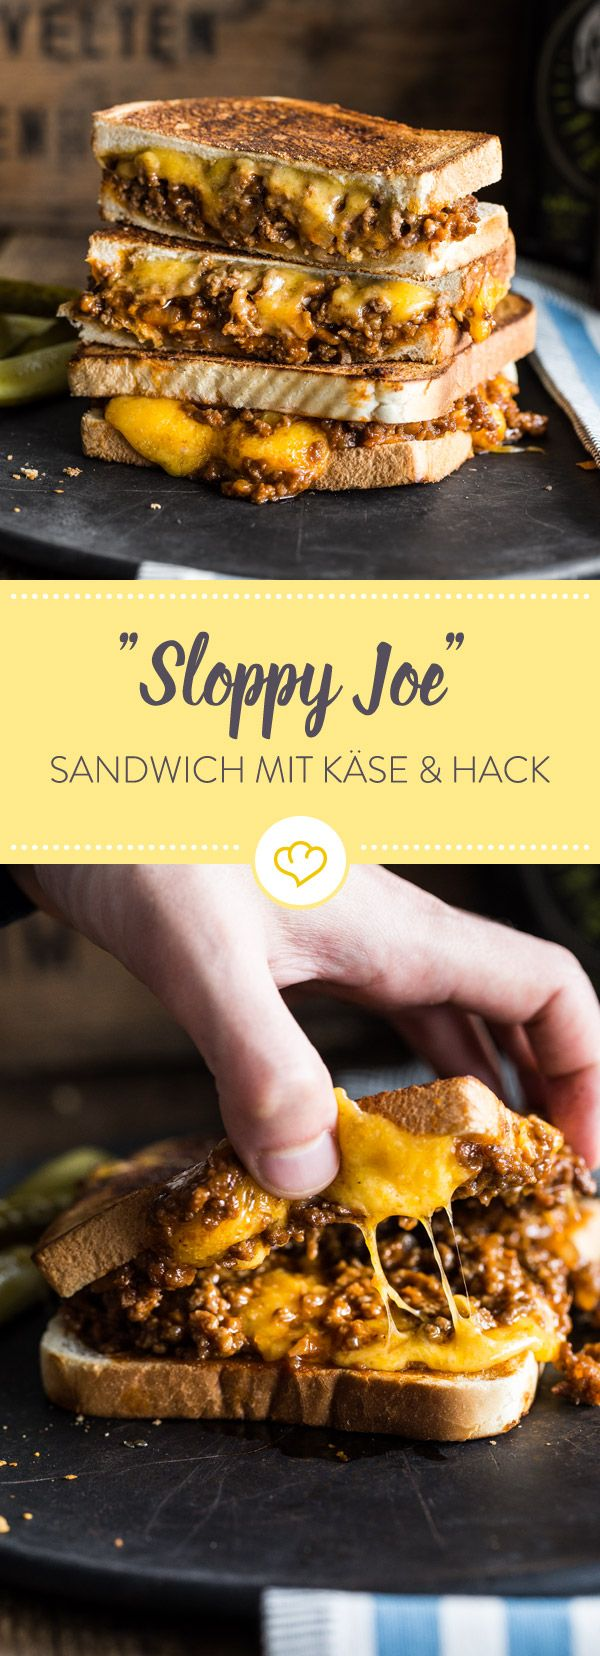 Sloppy Joe – Gegrilltes Sandwich mit Hack & Cheddar – Springlane